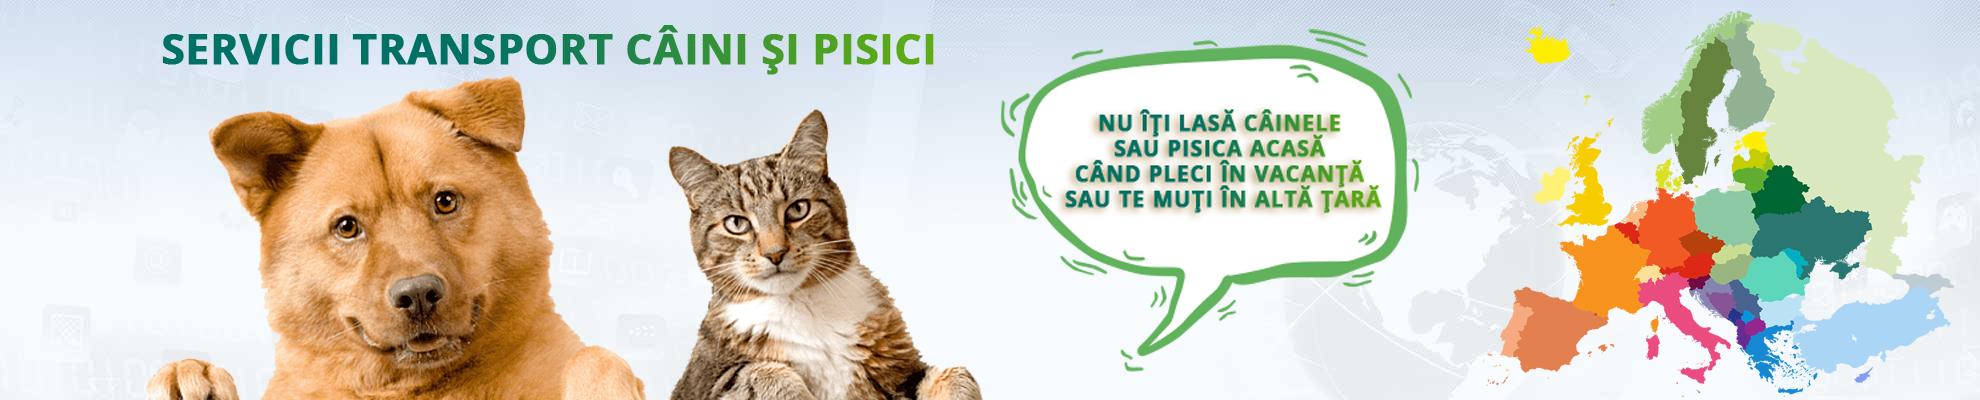 Servicii transport caini si pisici international